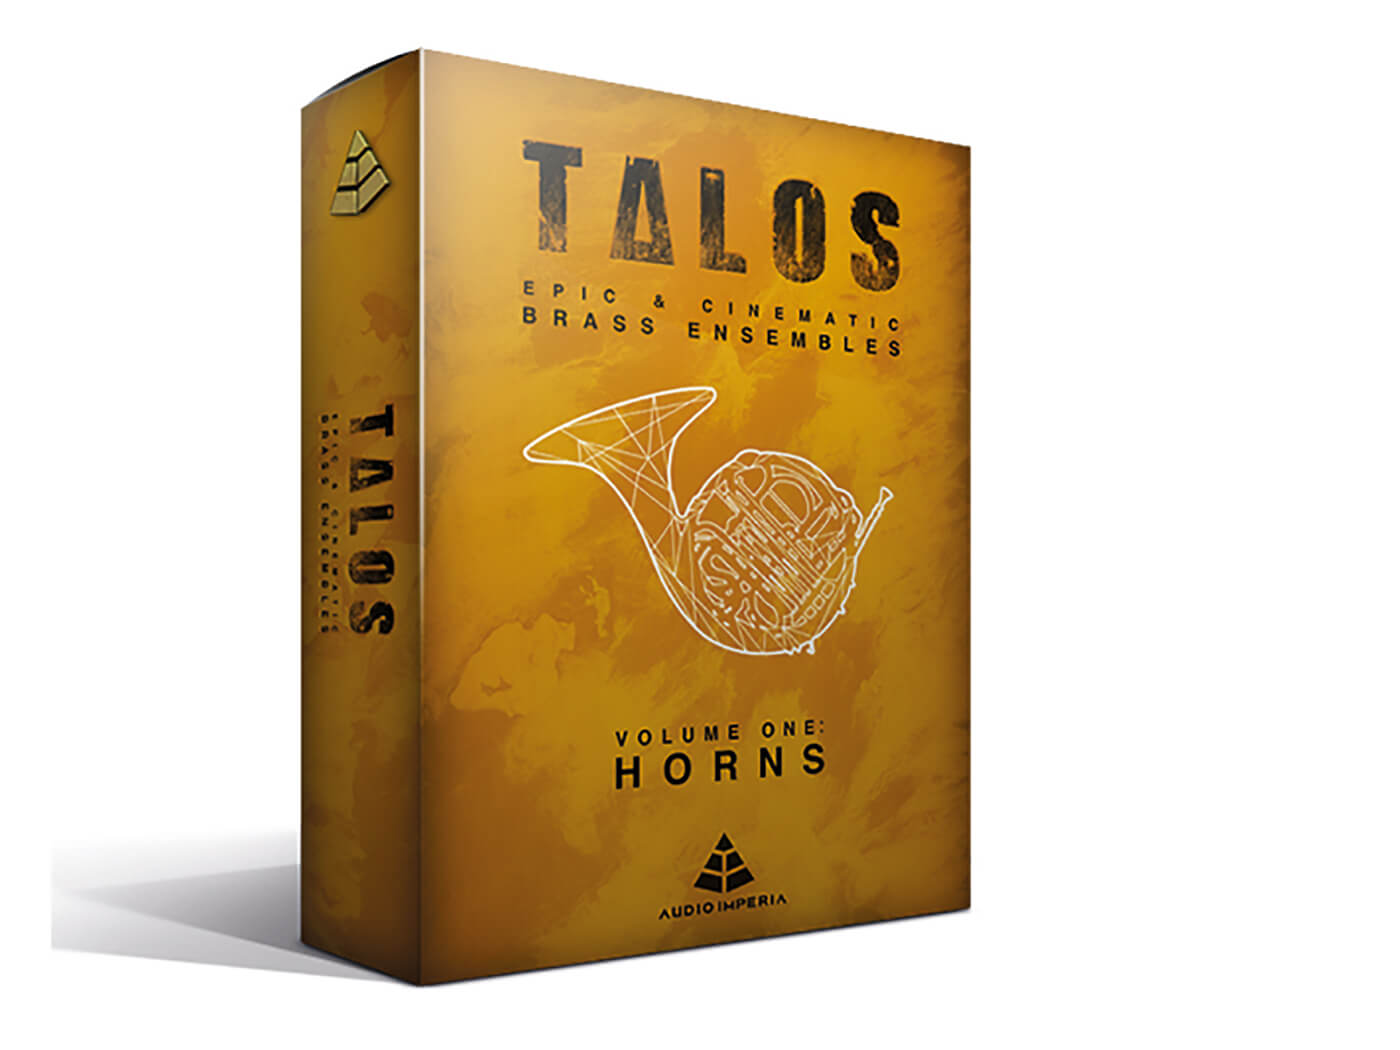 Audio Imperia Talos Vol. 1 & 2